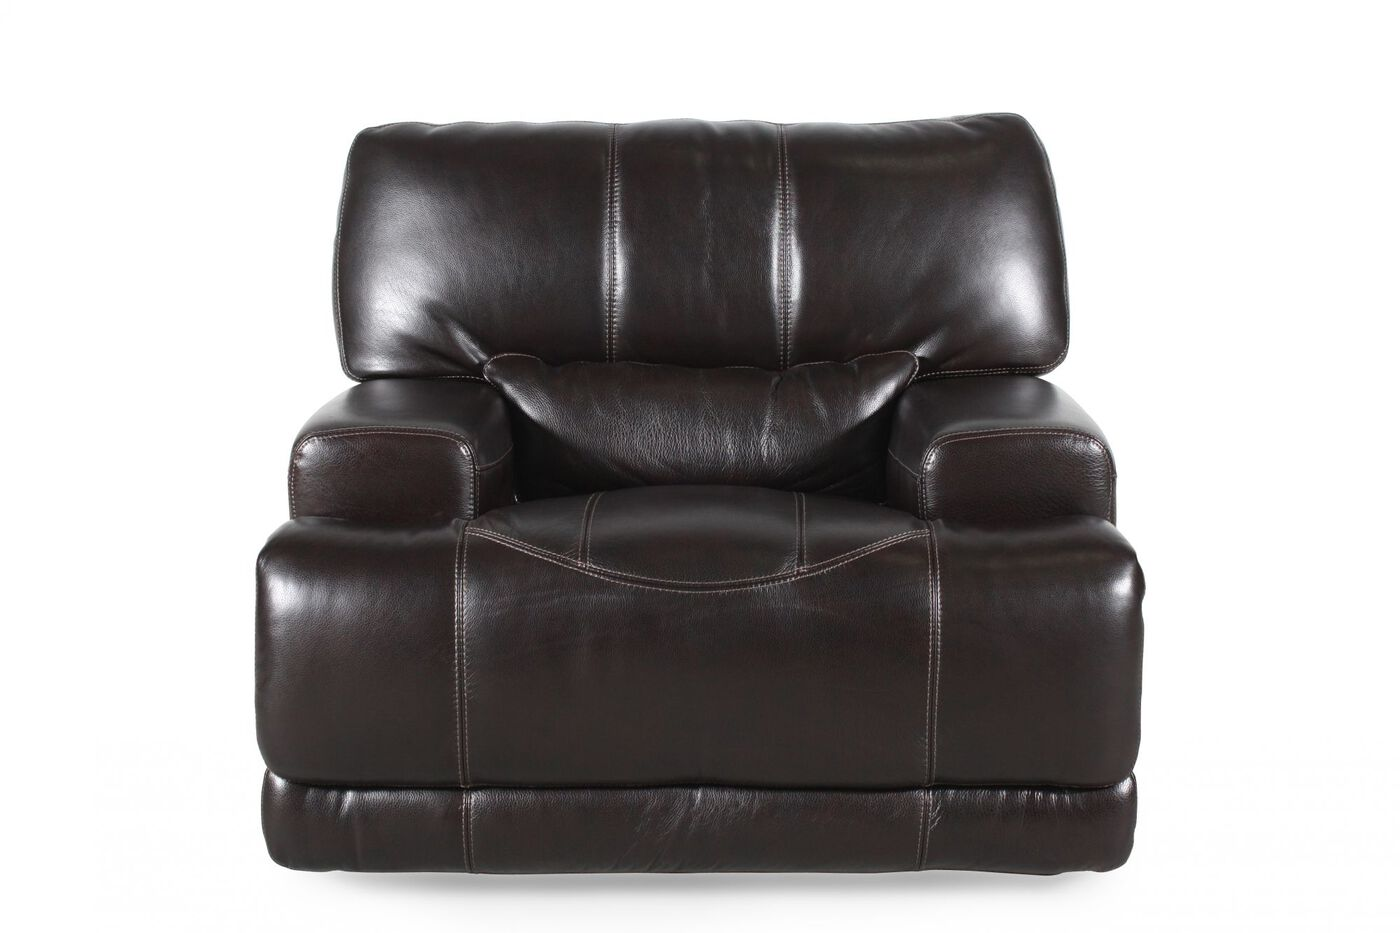 Simon Li Leather Longhorn Blackberry Recliner Mathis Brothers Furniture